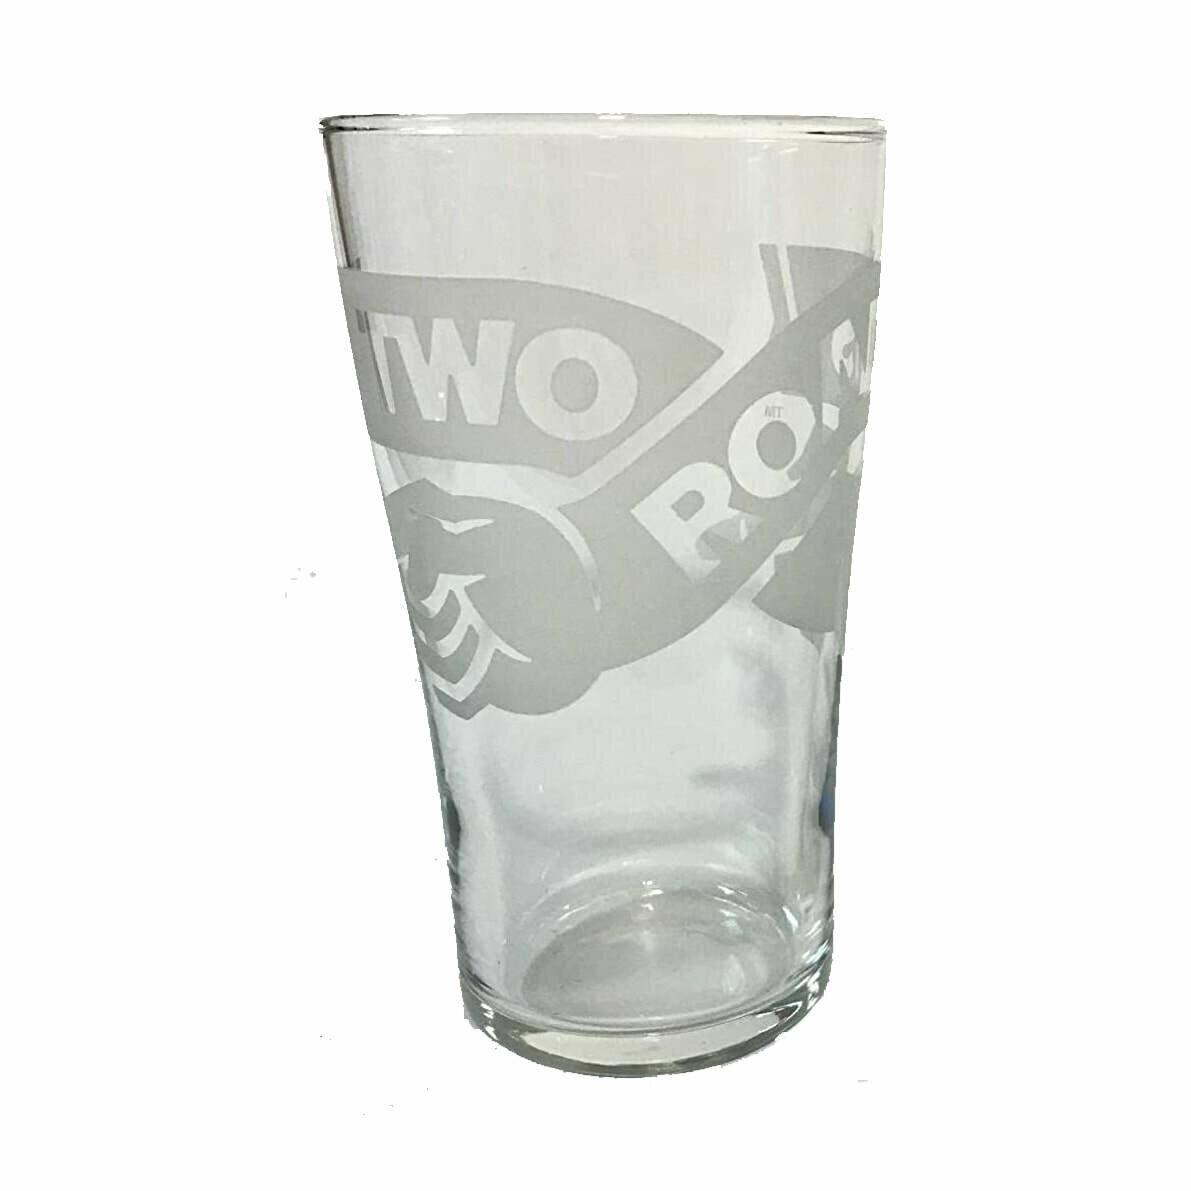 Two Roads Pint Glass